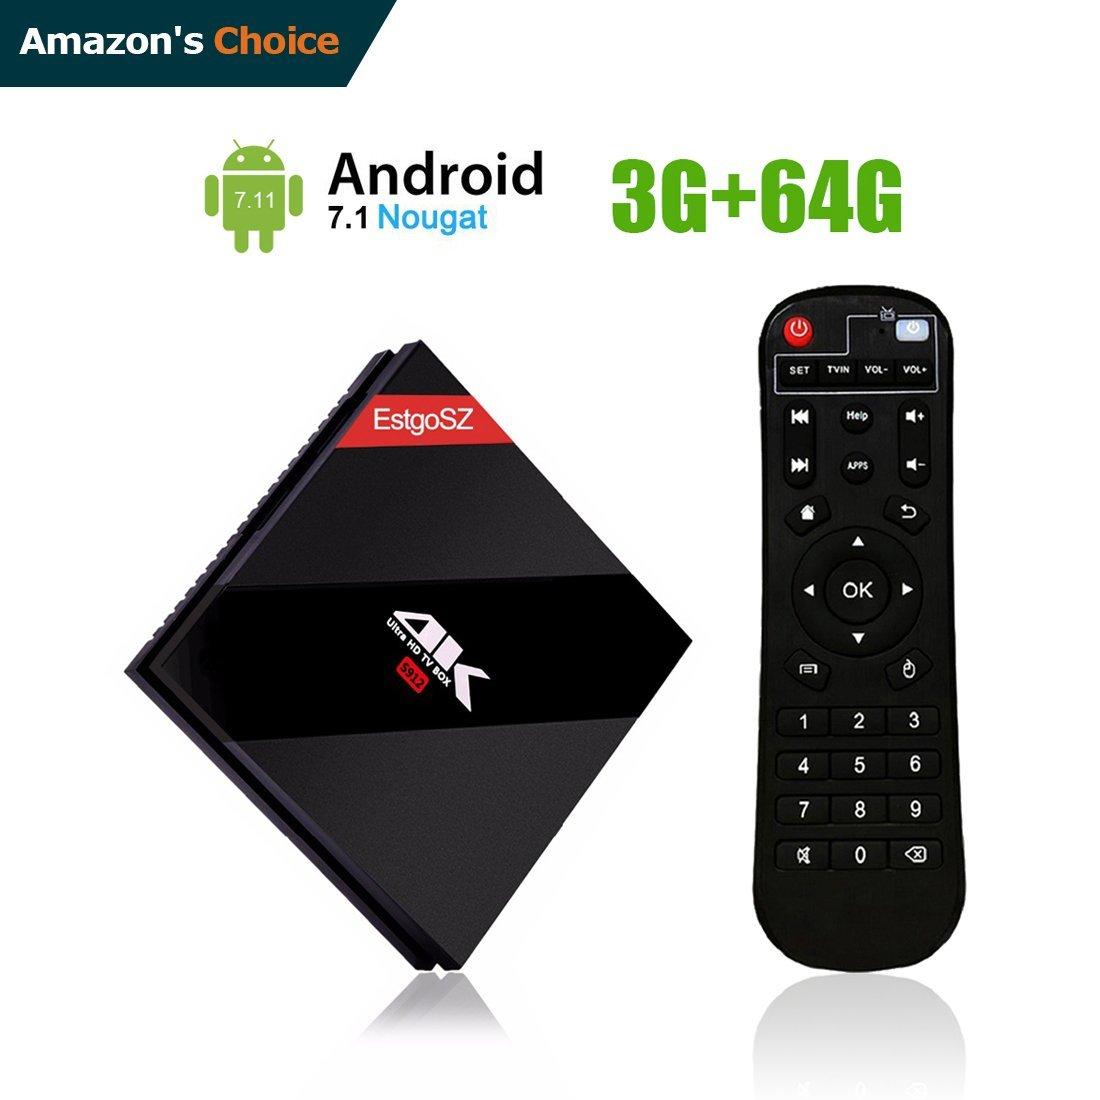 EstgoSZ 3GB / 64 GB Smart TV BOX Android 7.1 OS, Amlogic S912 Octa Core 64 bits with BT 4.1 Dual Band WIFI 2.4G/5.0 GHz 1000M LAN Mini PC Google Android Internet Set Top Box